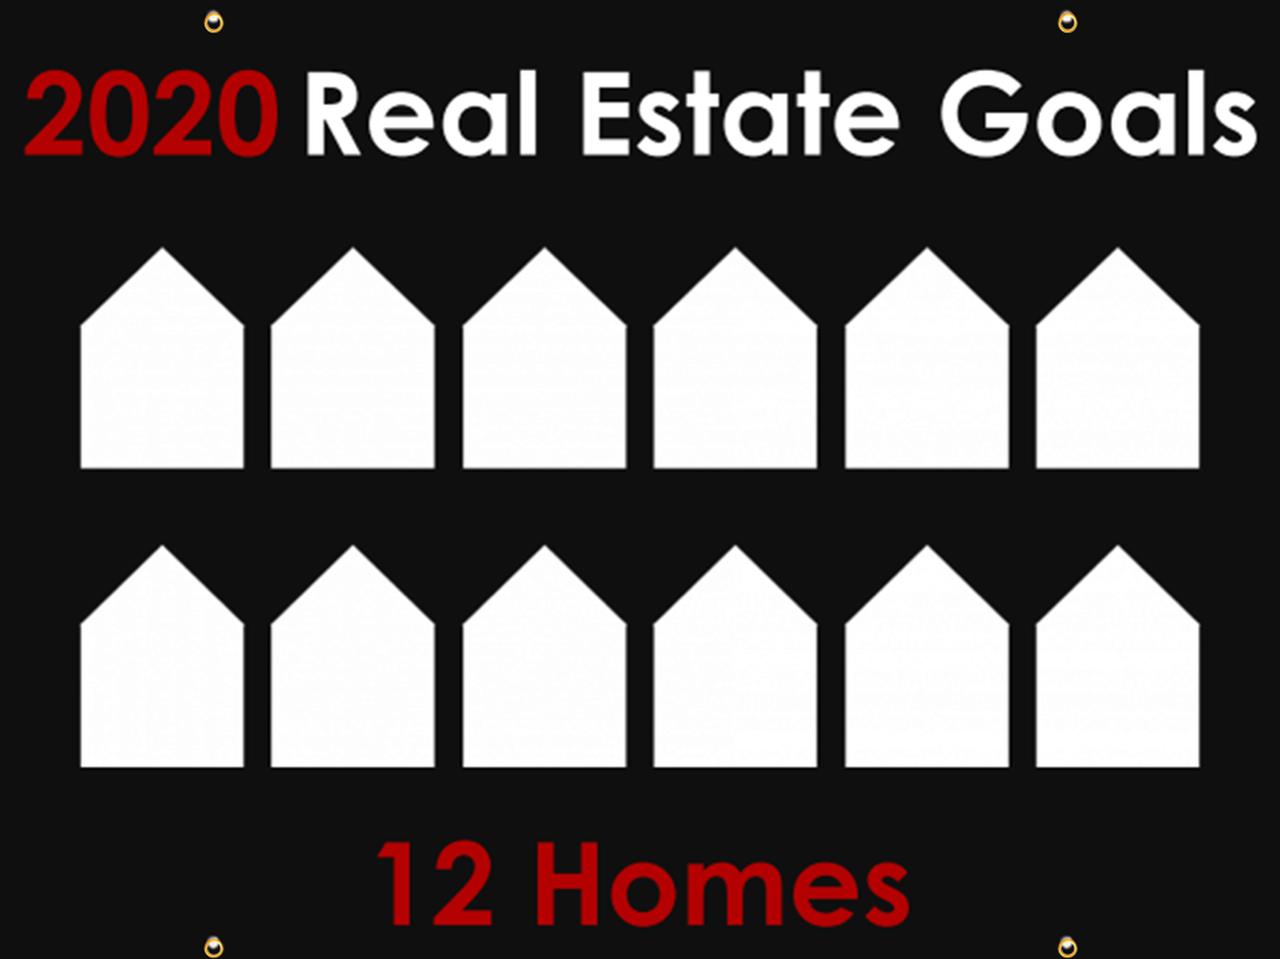 2020 Real Estate Goals